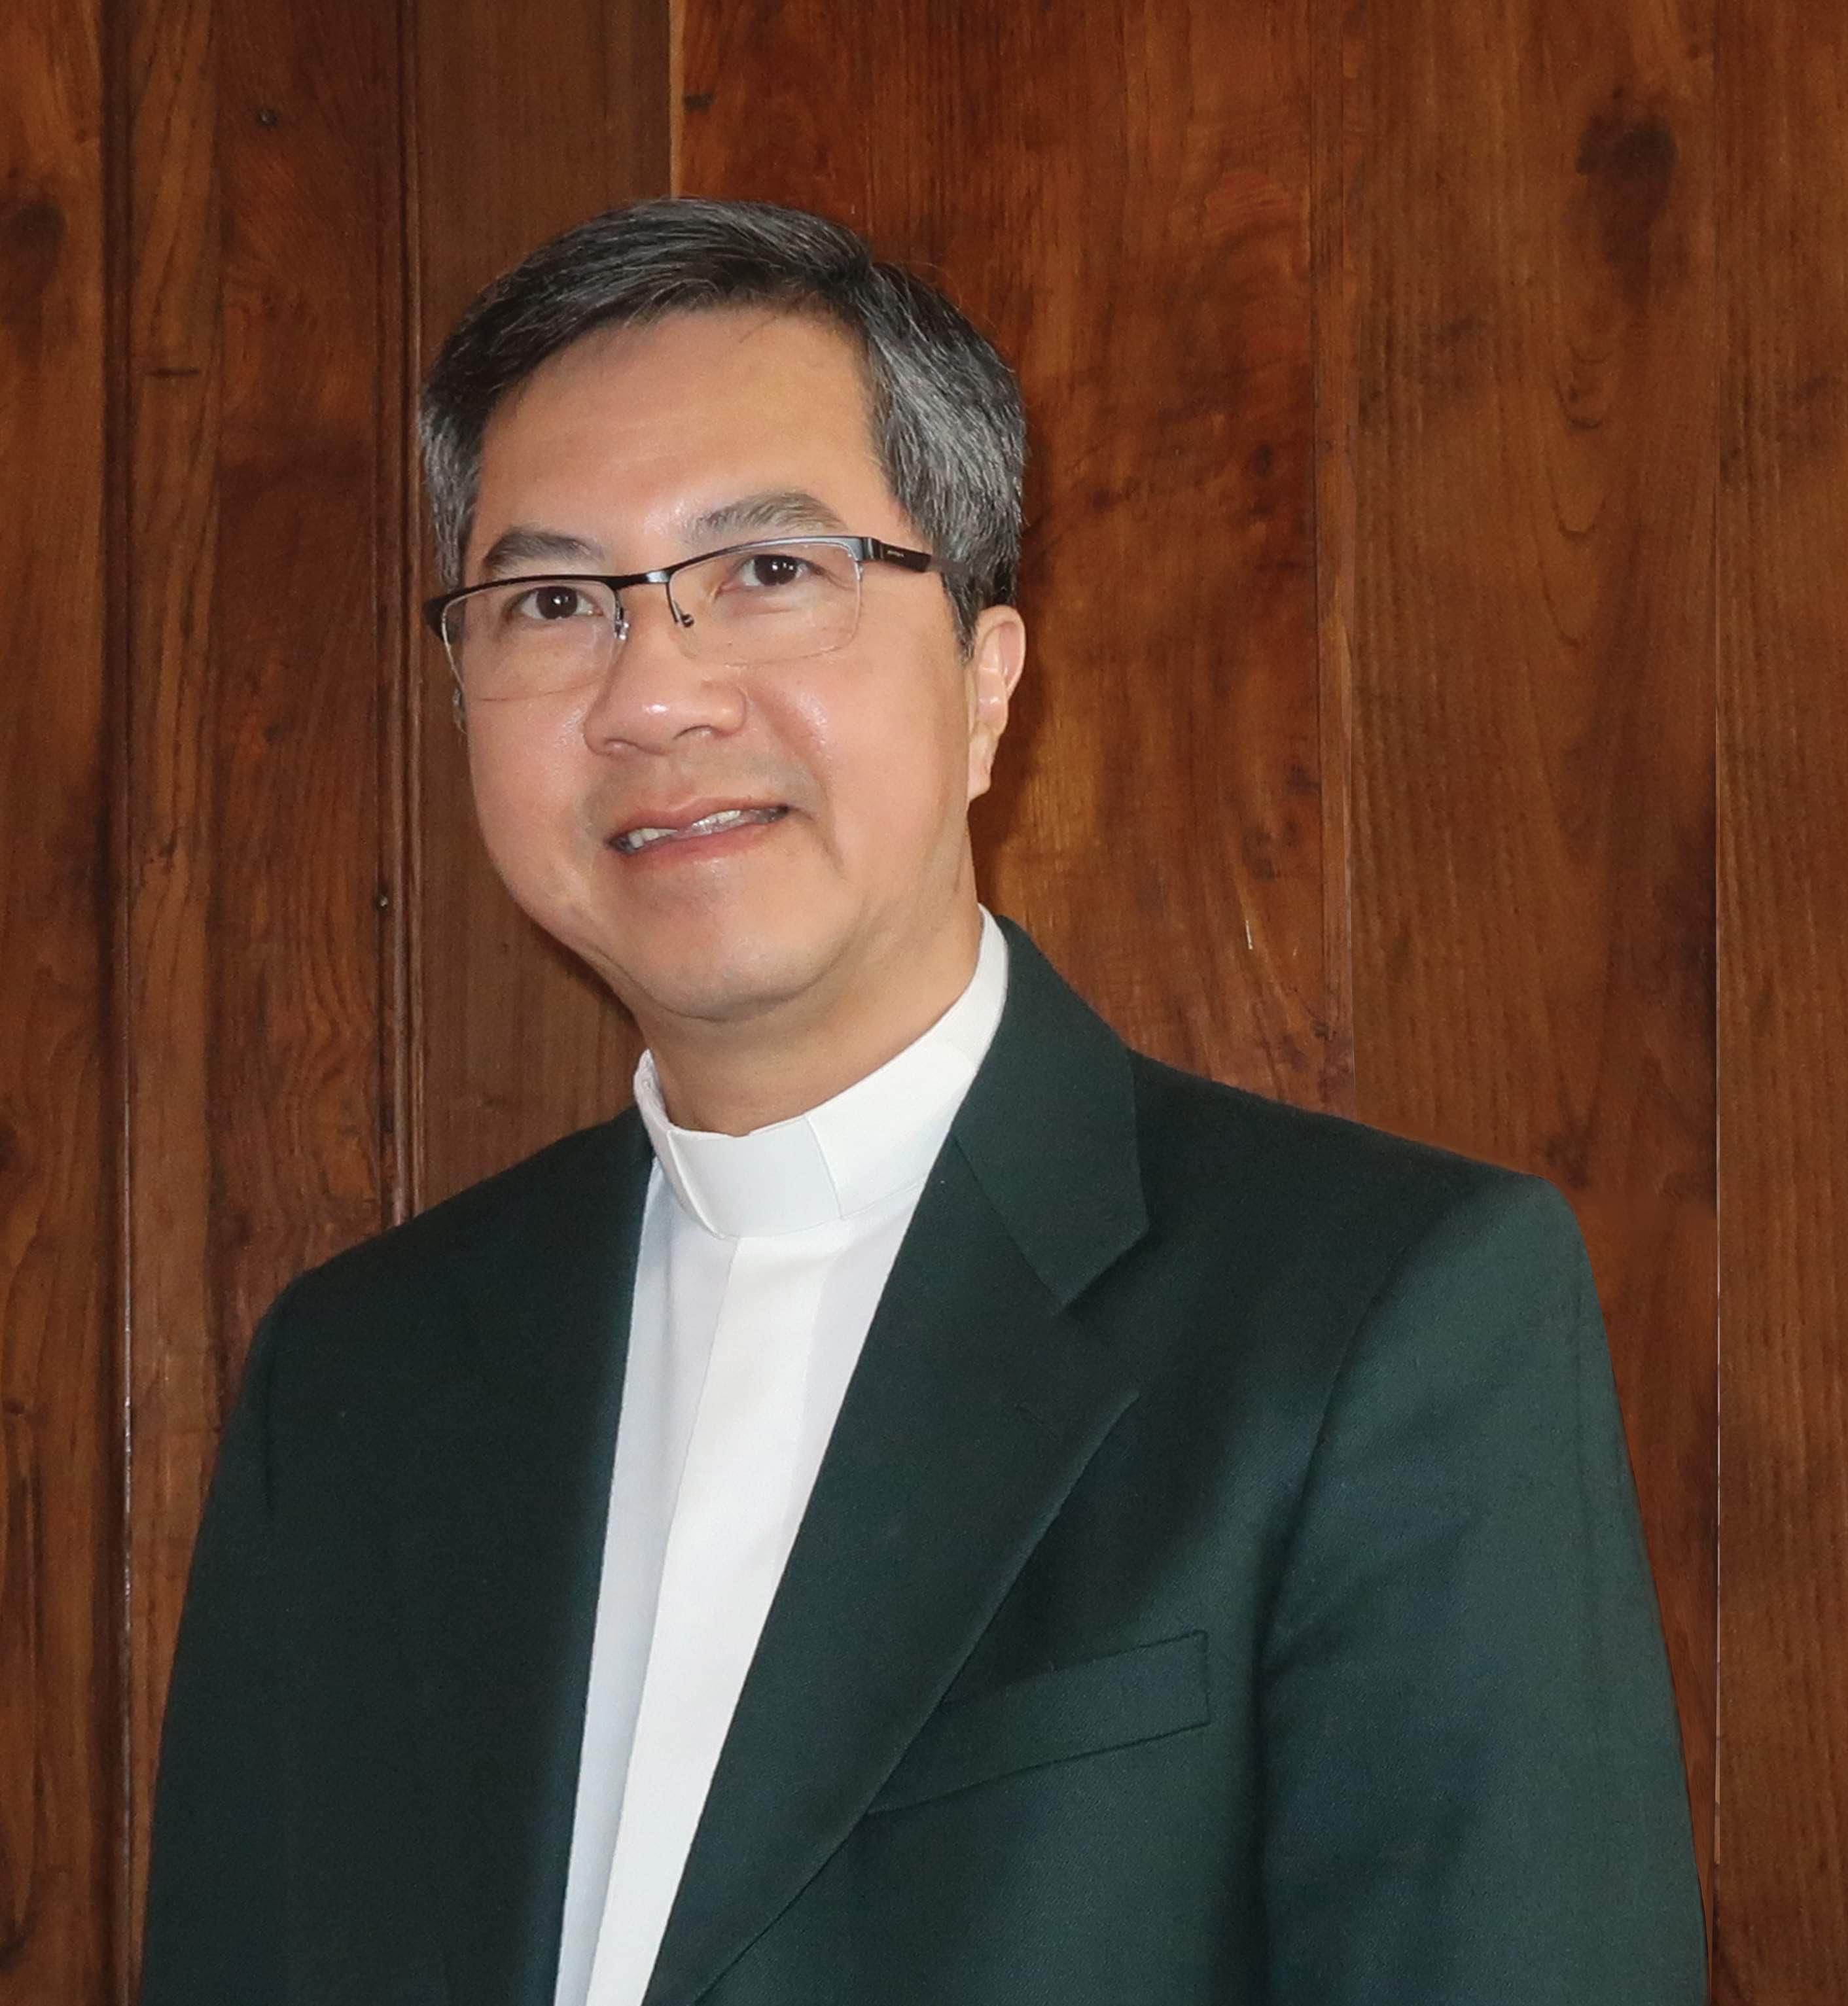 LM Giuse Vũ Thái Hoà